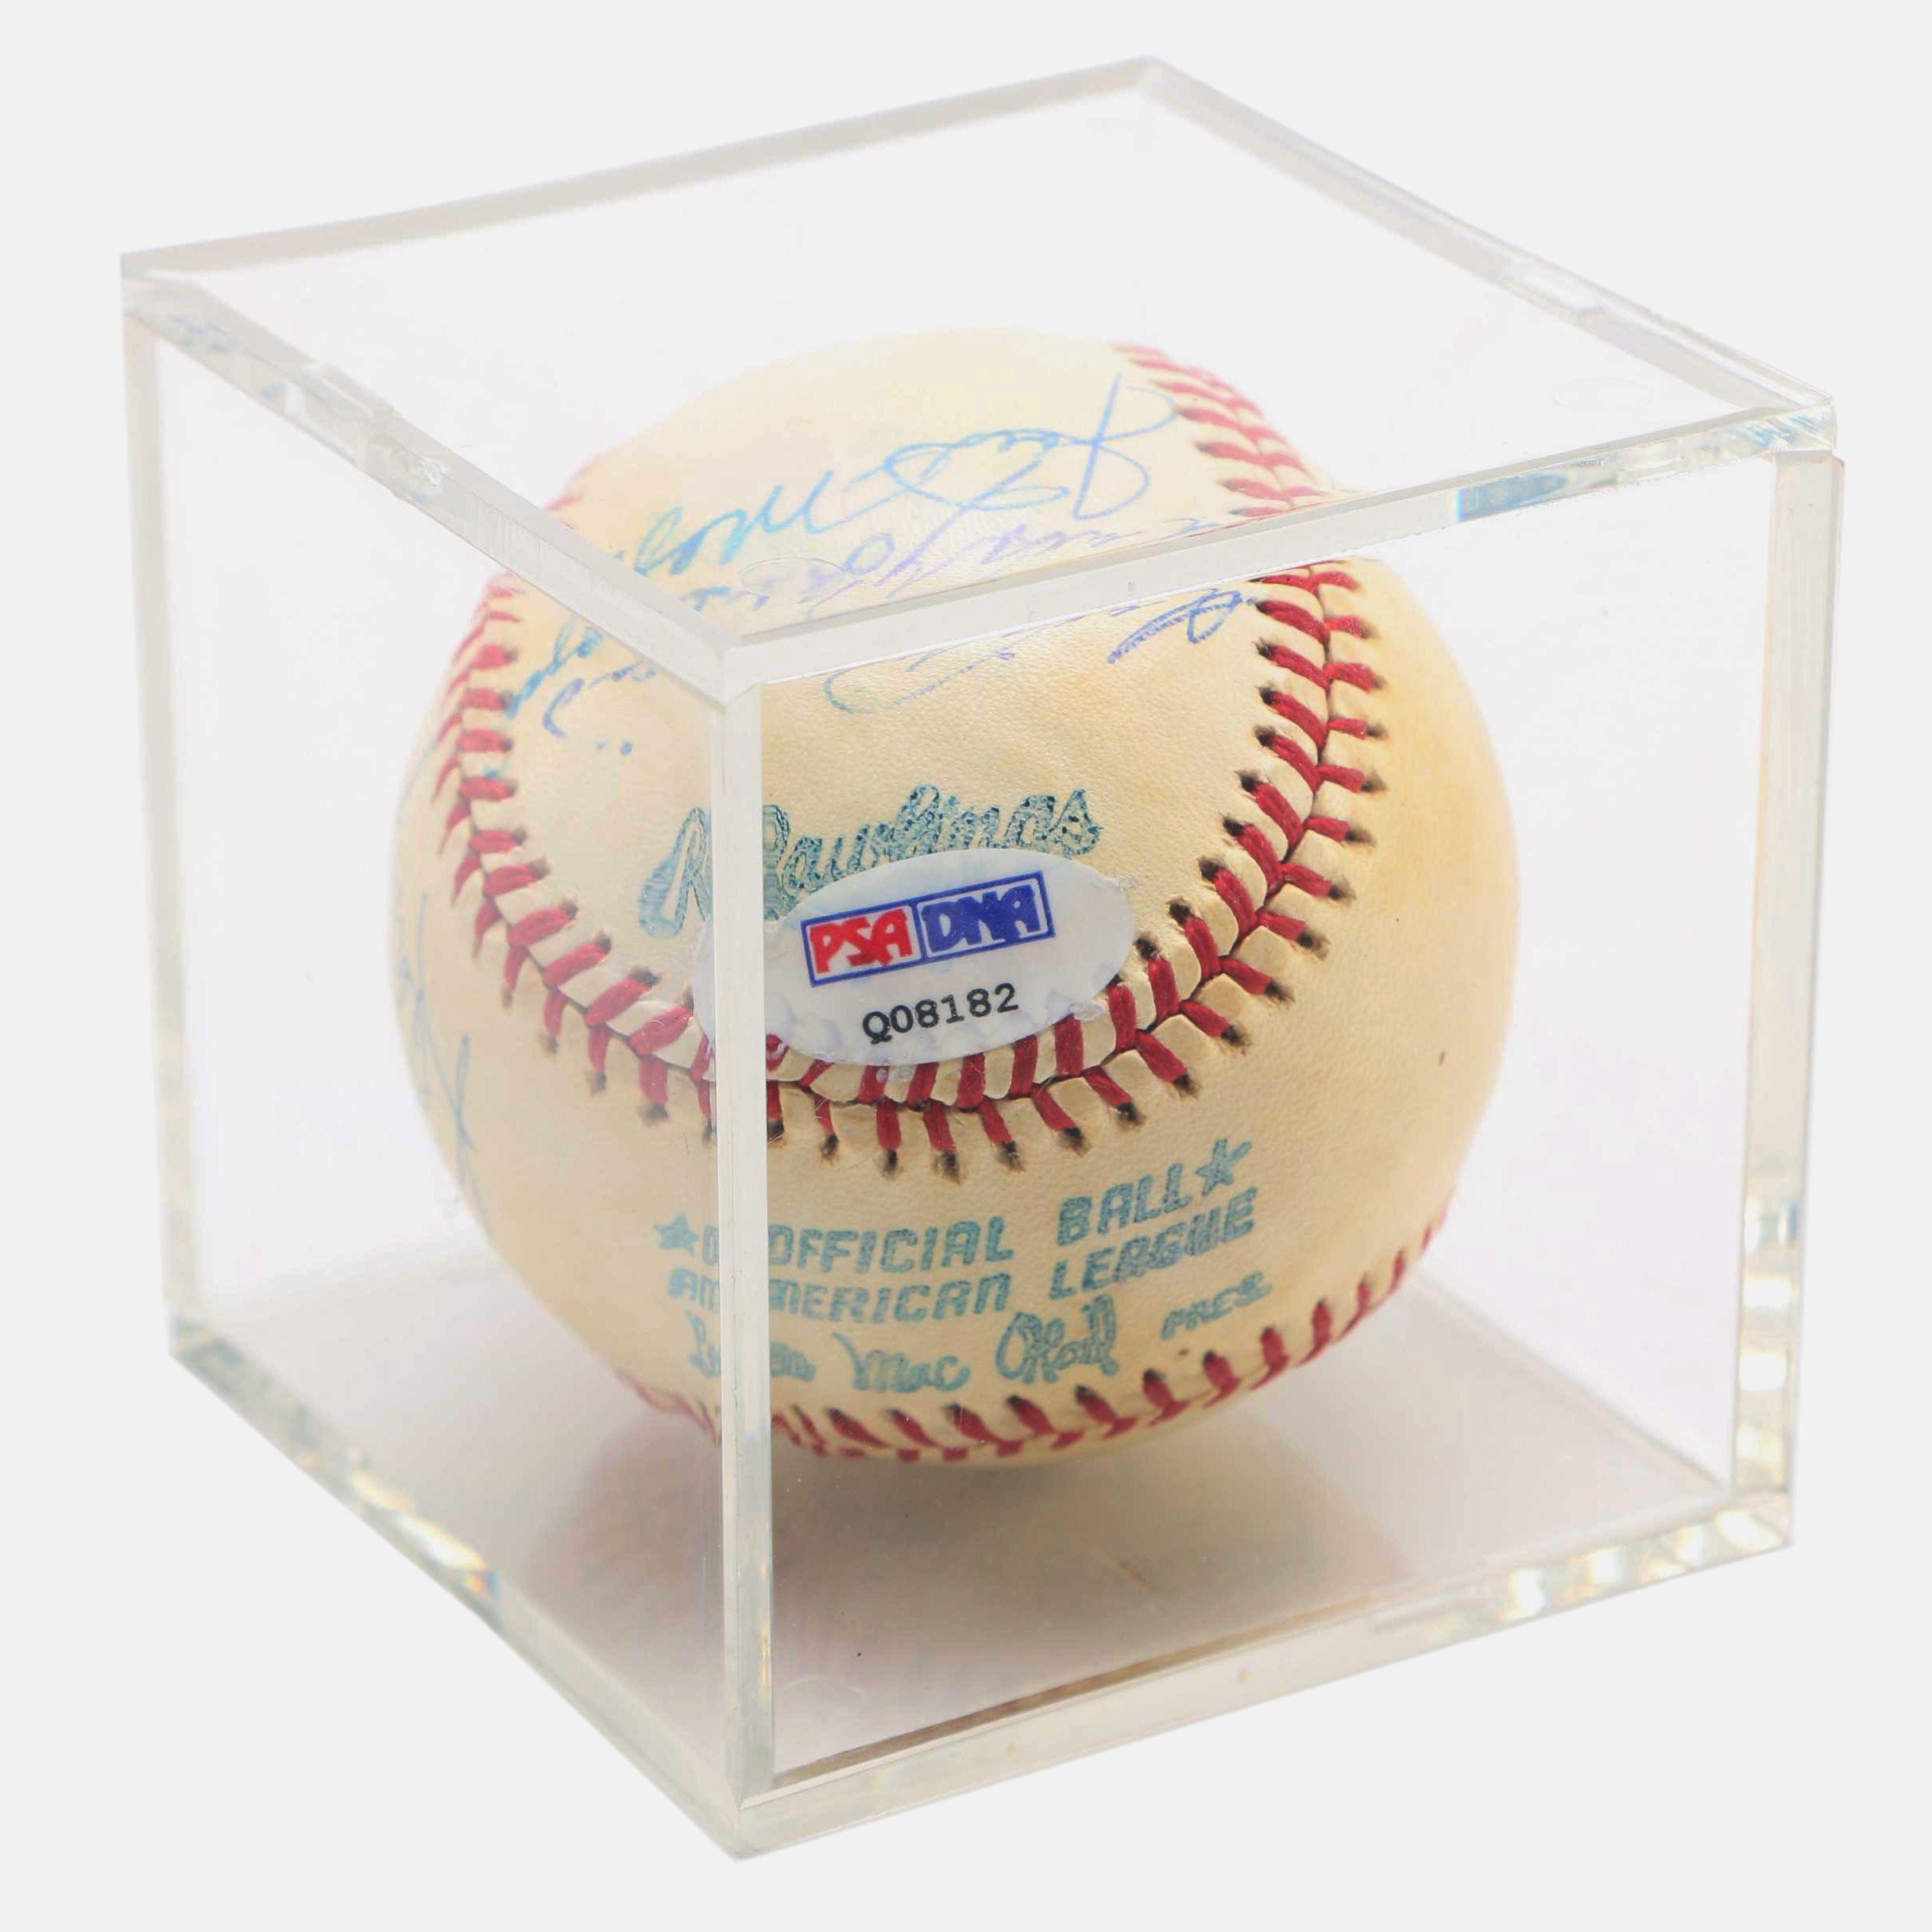 Circa 1970s Signed Baseball with Joe DiMaggio and Yogi Berra